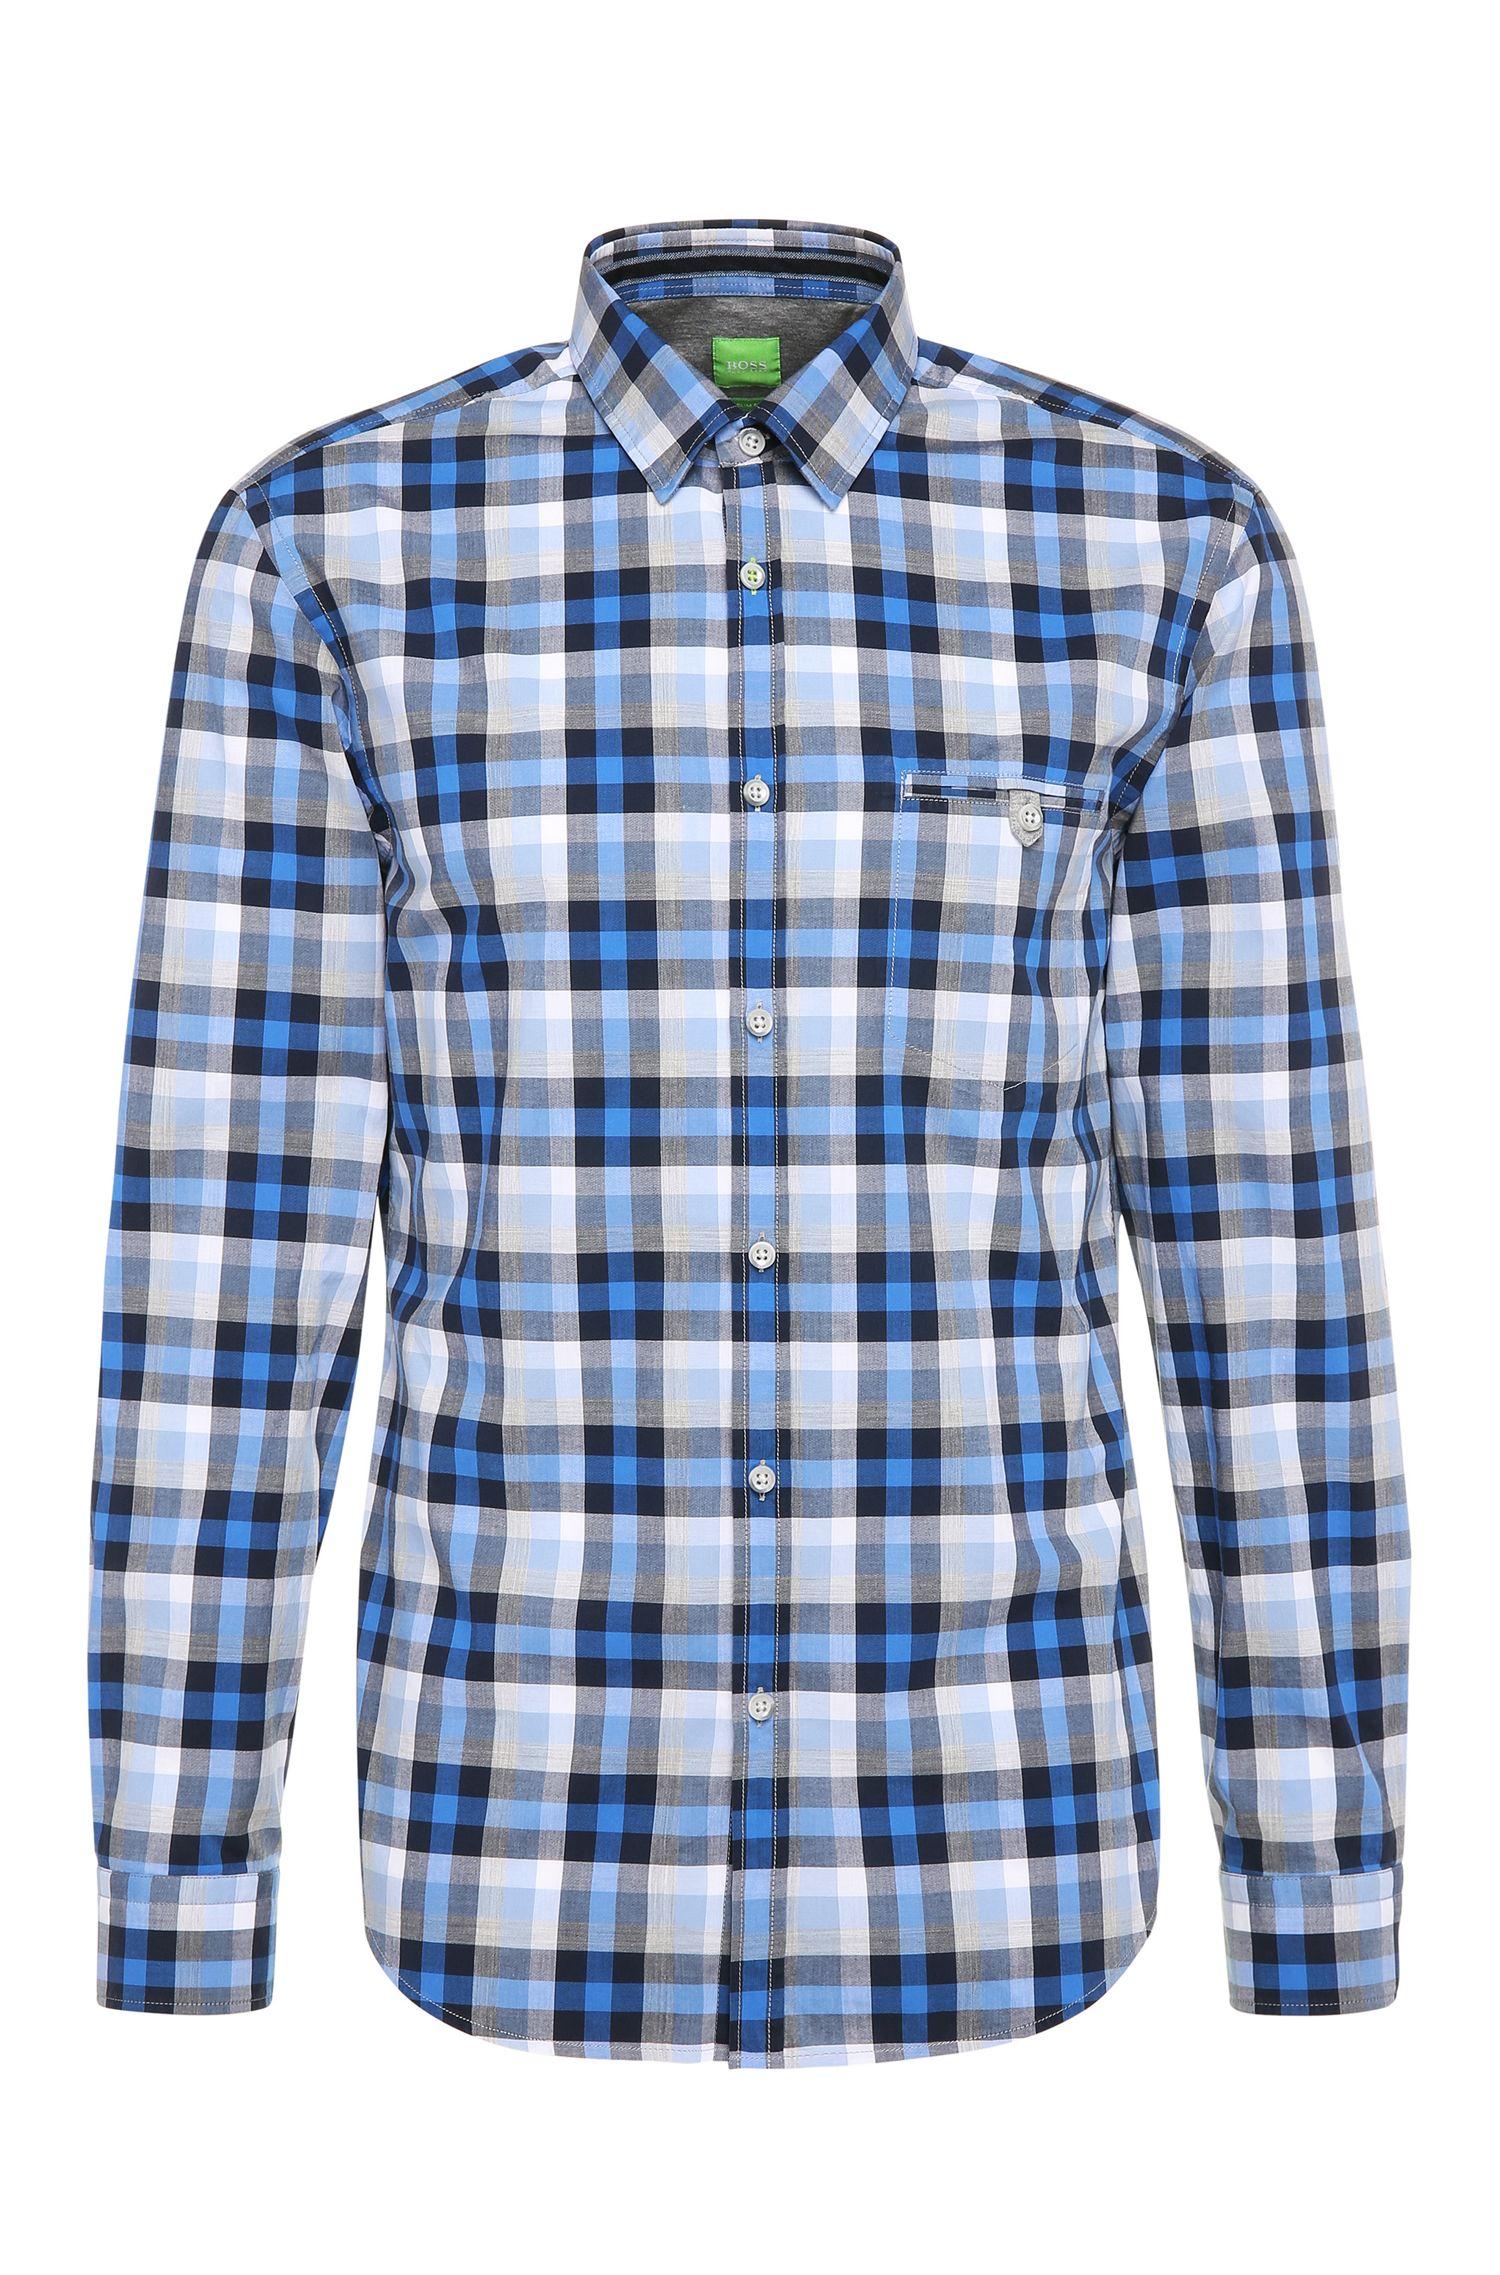 'Blumas' | Slim Fit, Cotton Button Down Shirt